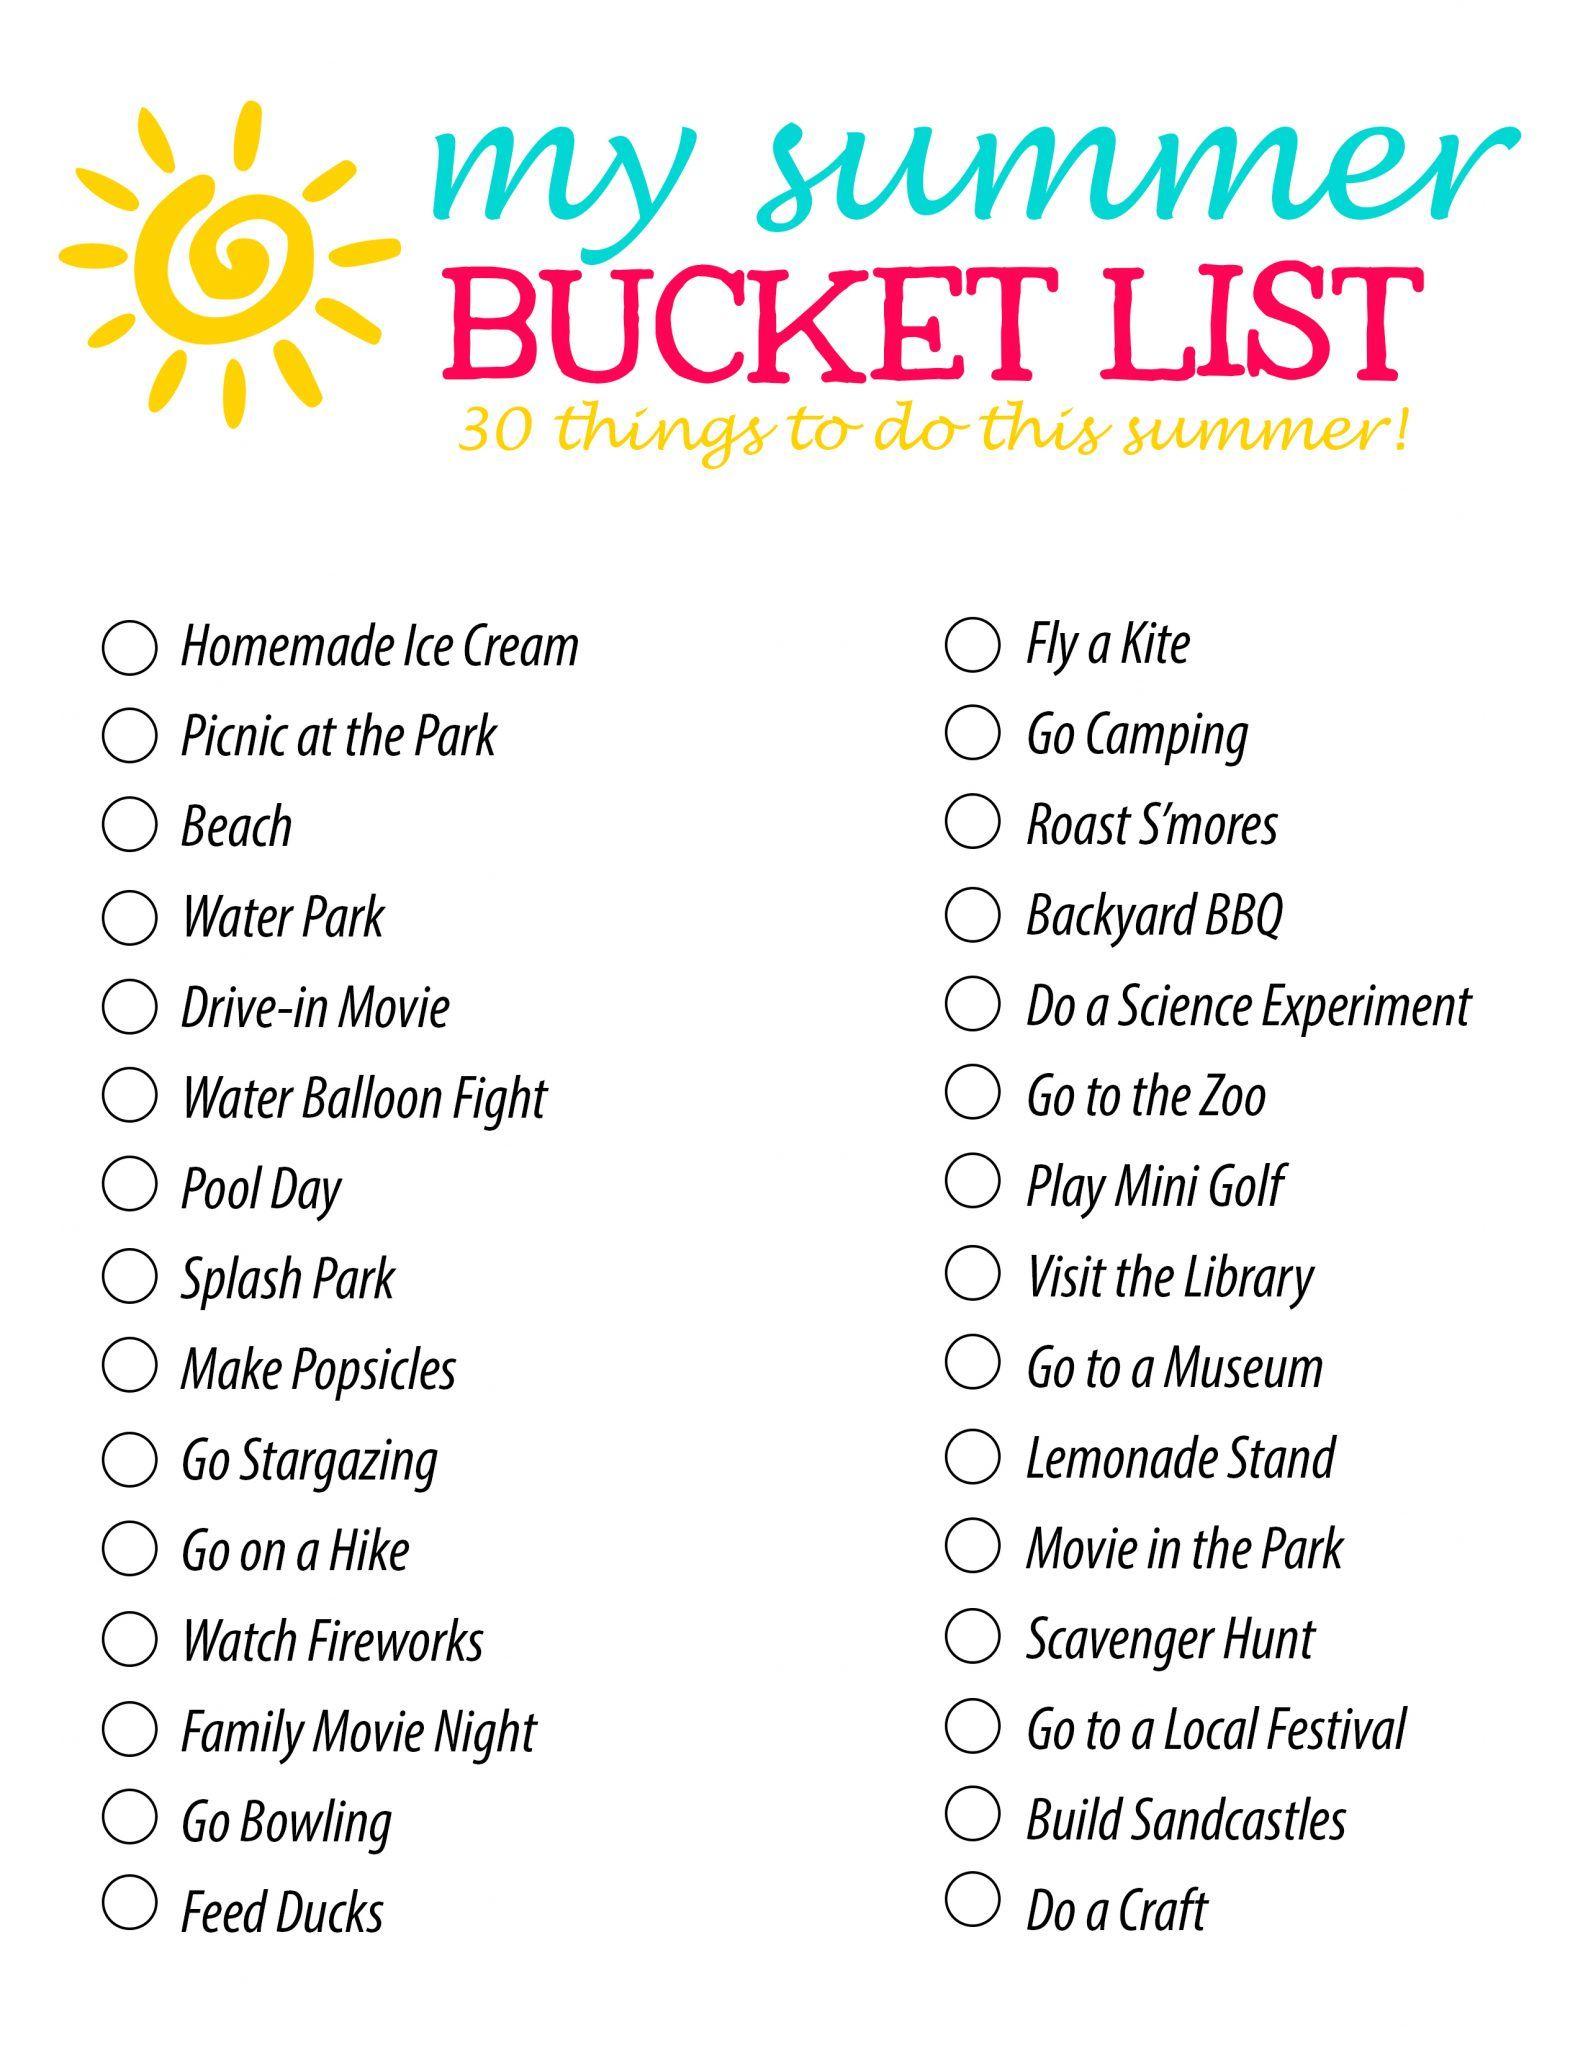 Summer Bucket List 30 Fun Summer Activity ideas for Families and